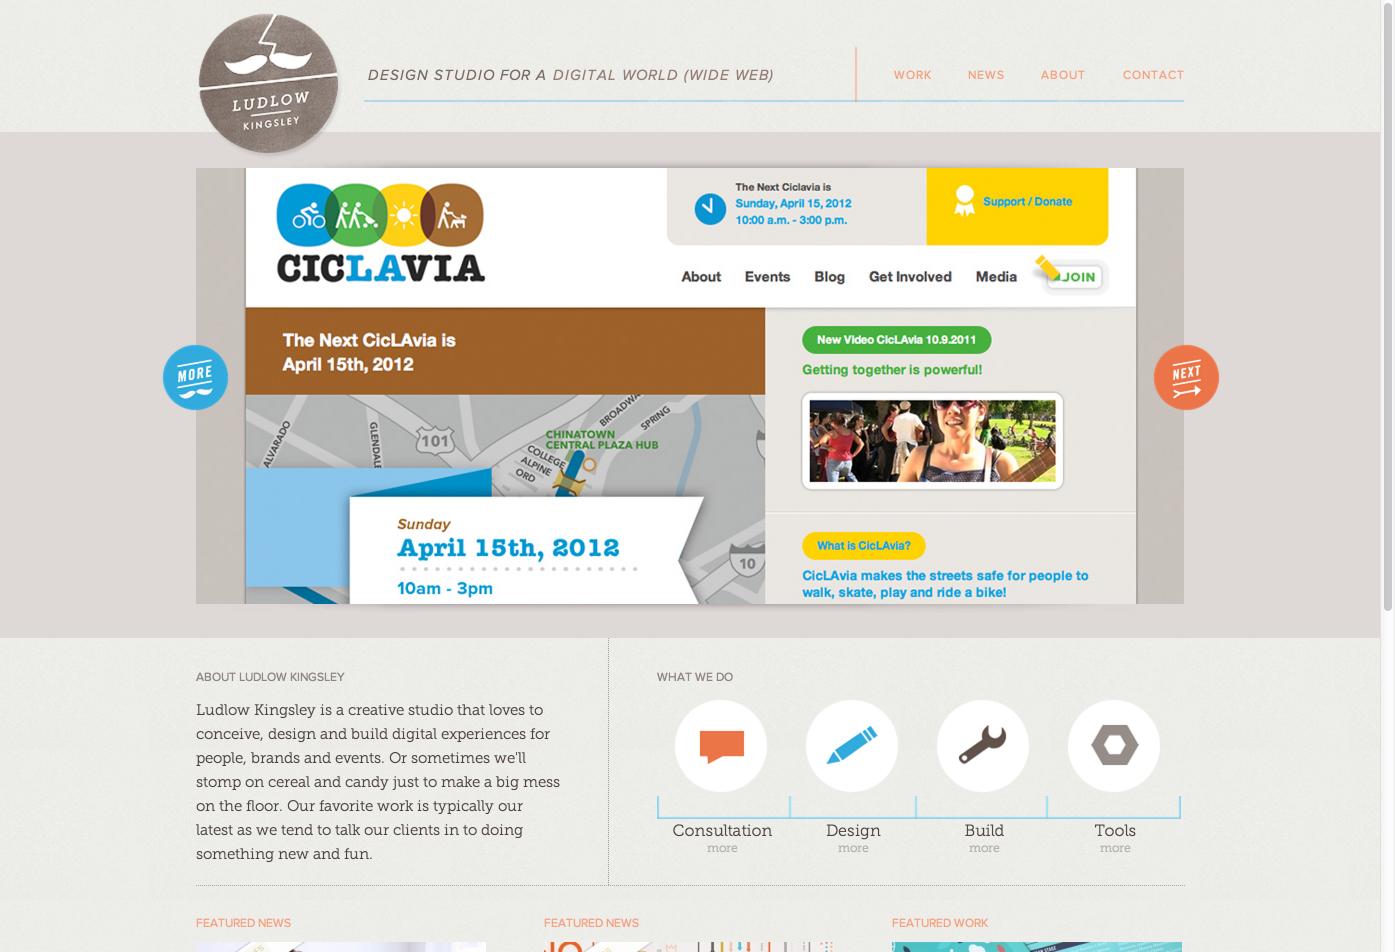 Ludlow Kingsley Los Angeles Web Design Web Design Firm Web Design Web Development Design